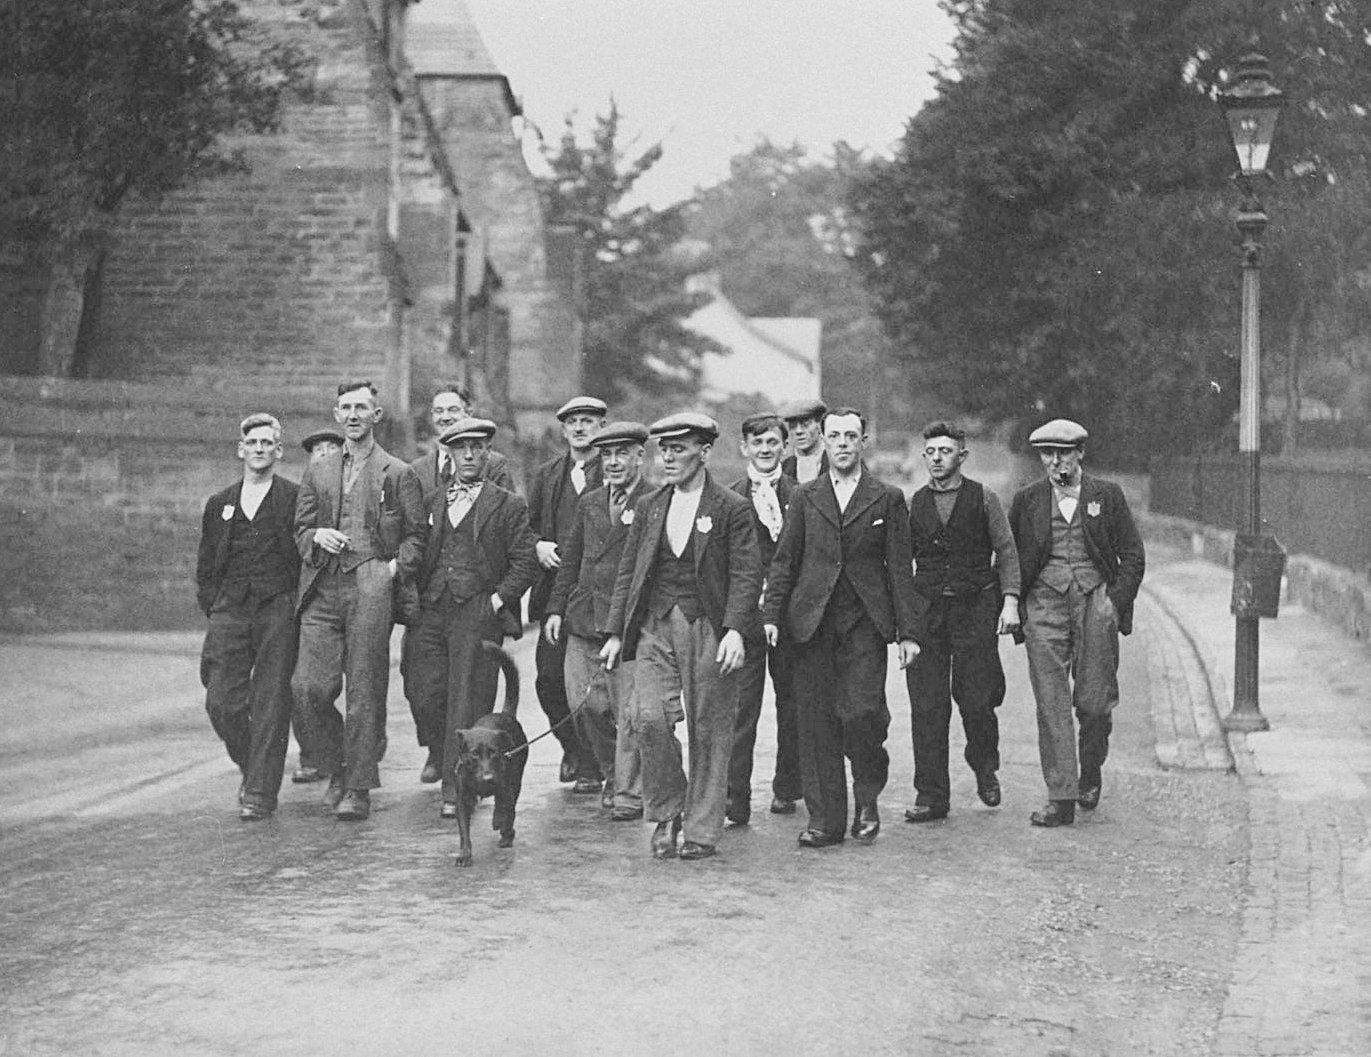 Jarrow March - Wikipedia